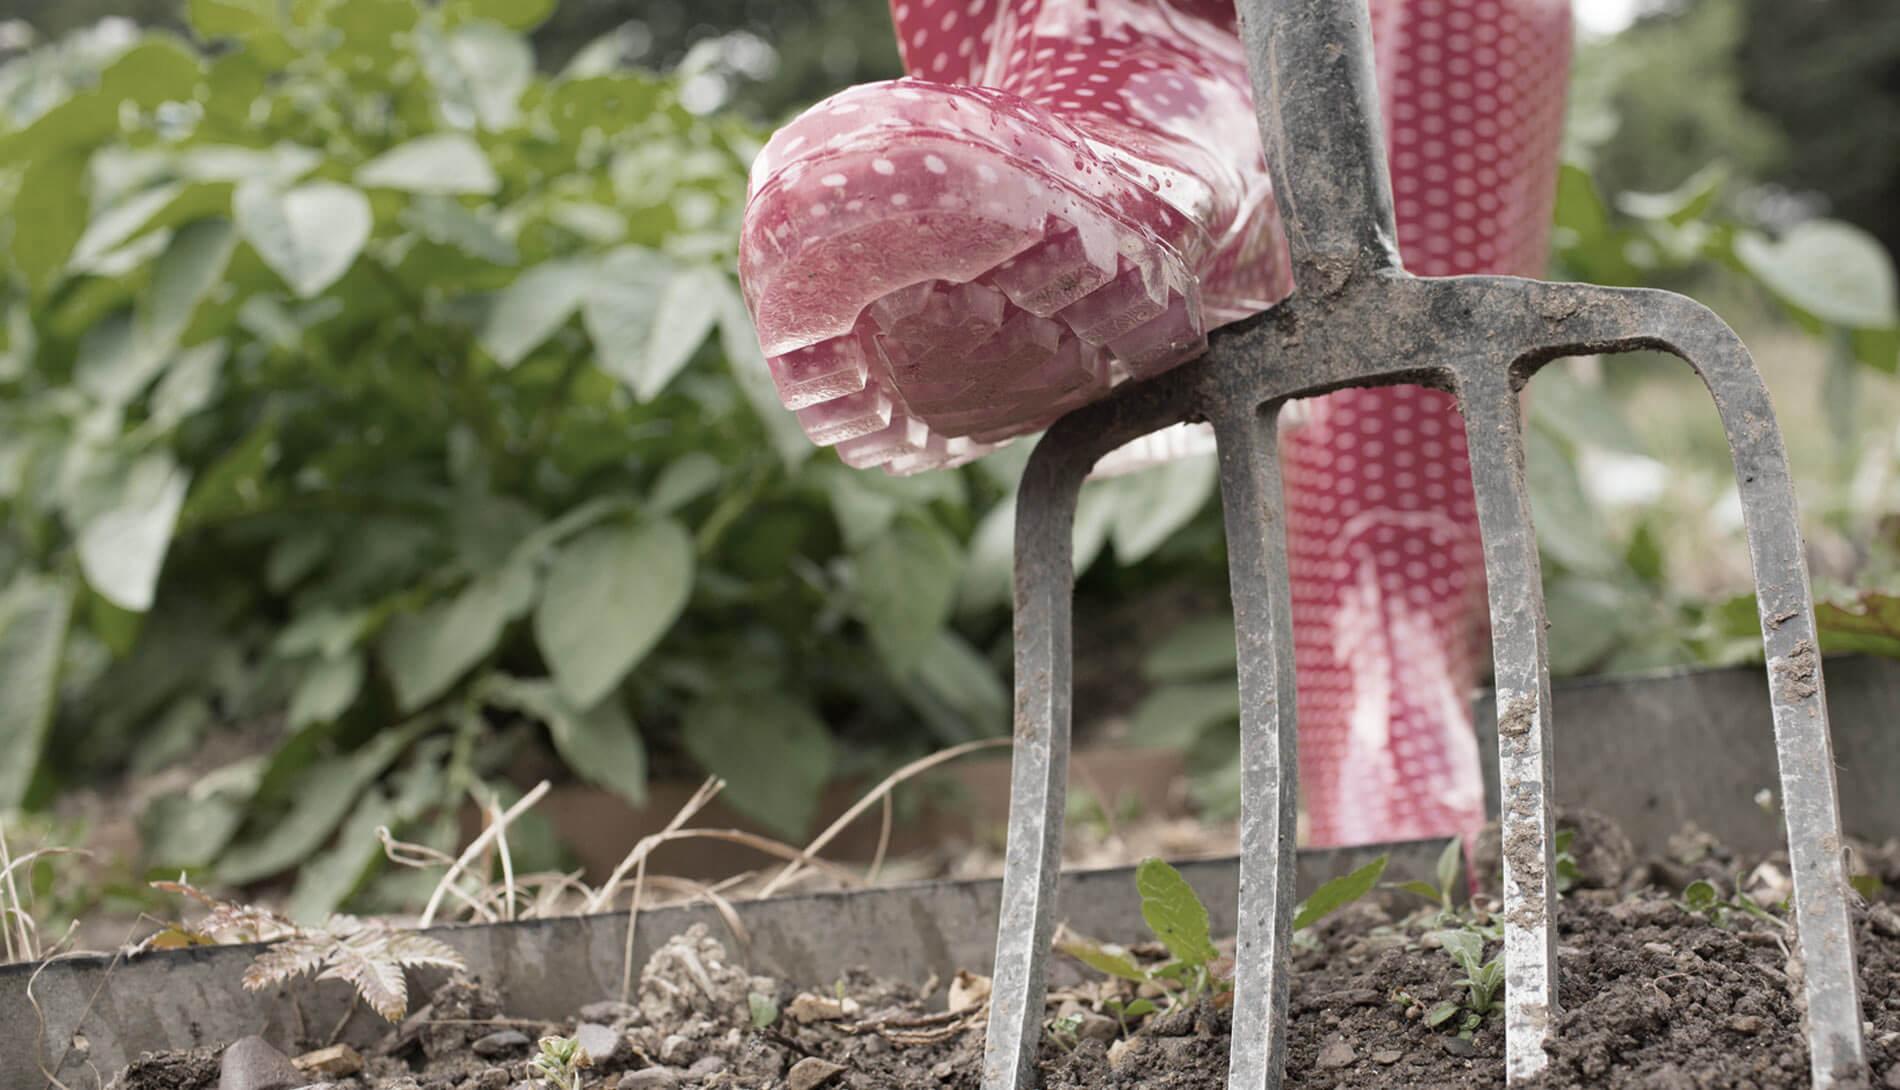 Close-up of gardening pitchfork